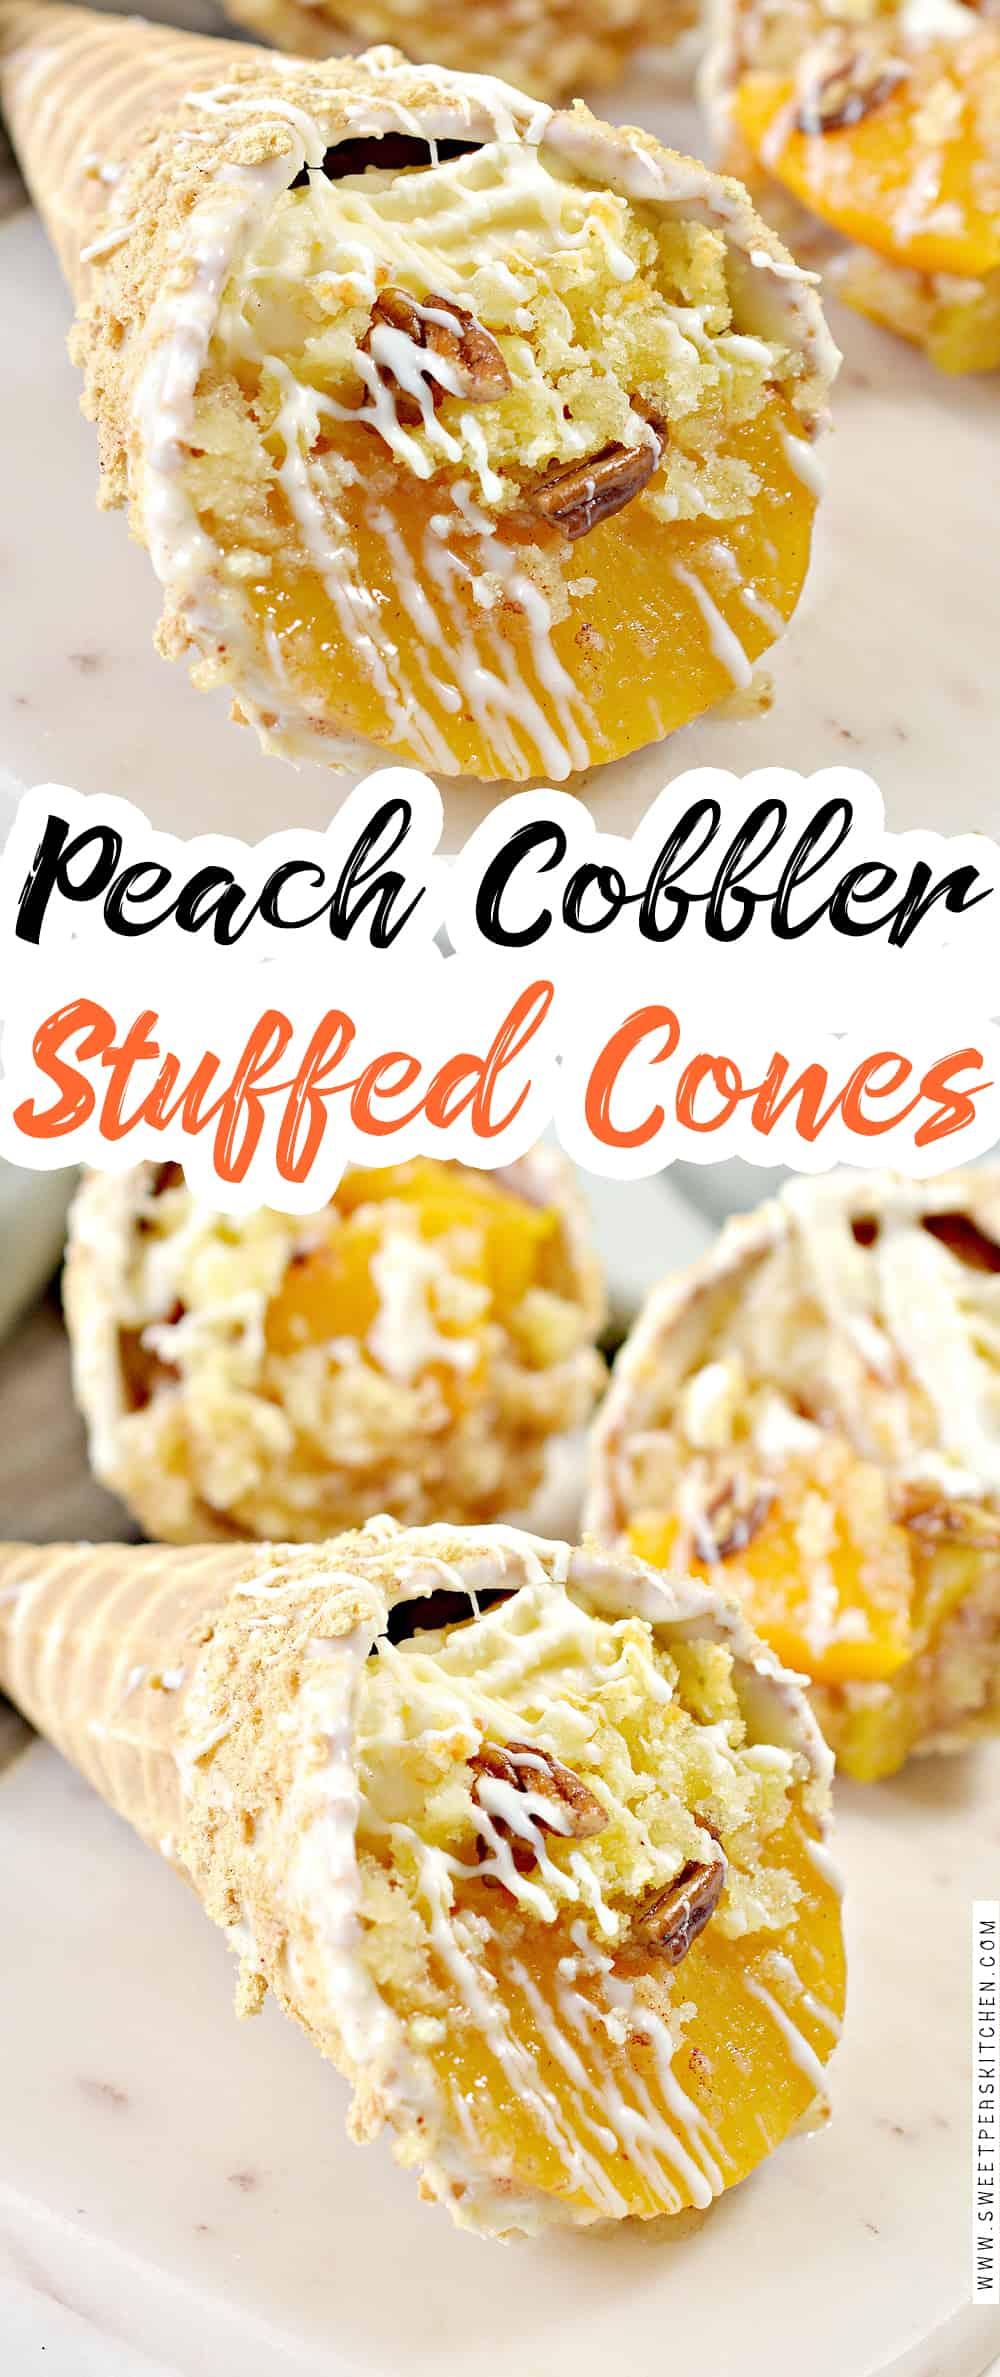 Peach Cobbler Stuffed Cones